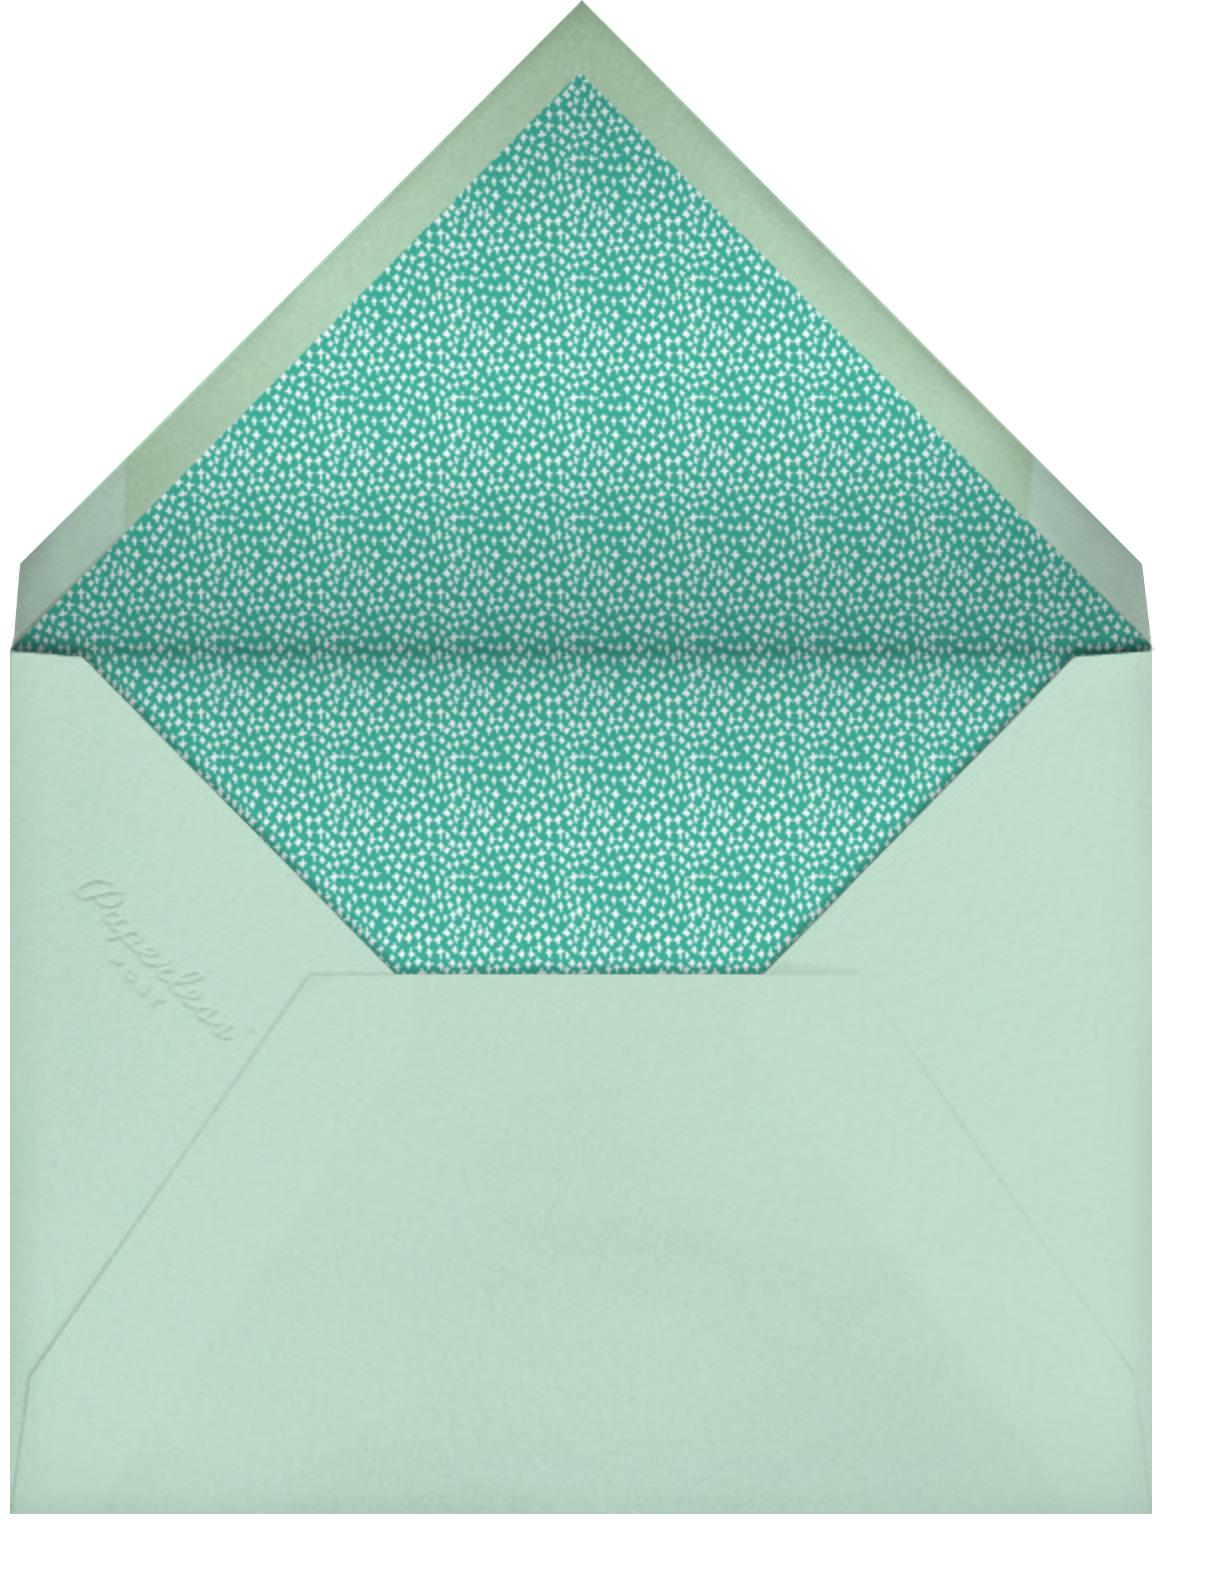 Vanilla or Chocolate Cake (Invitation) - Mr. Boddington's Studio - Kids' birthday - envelope back